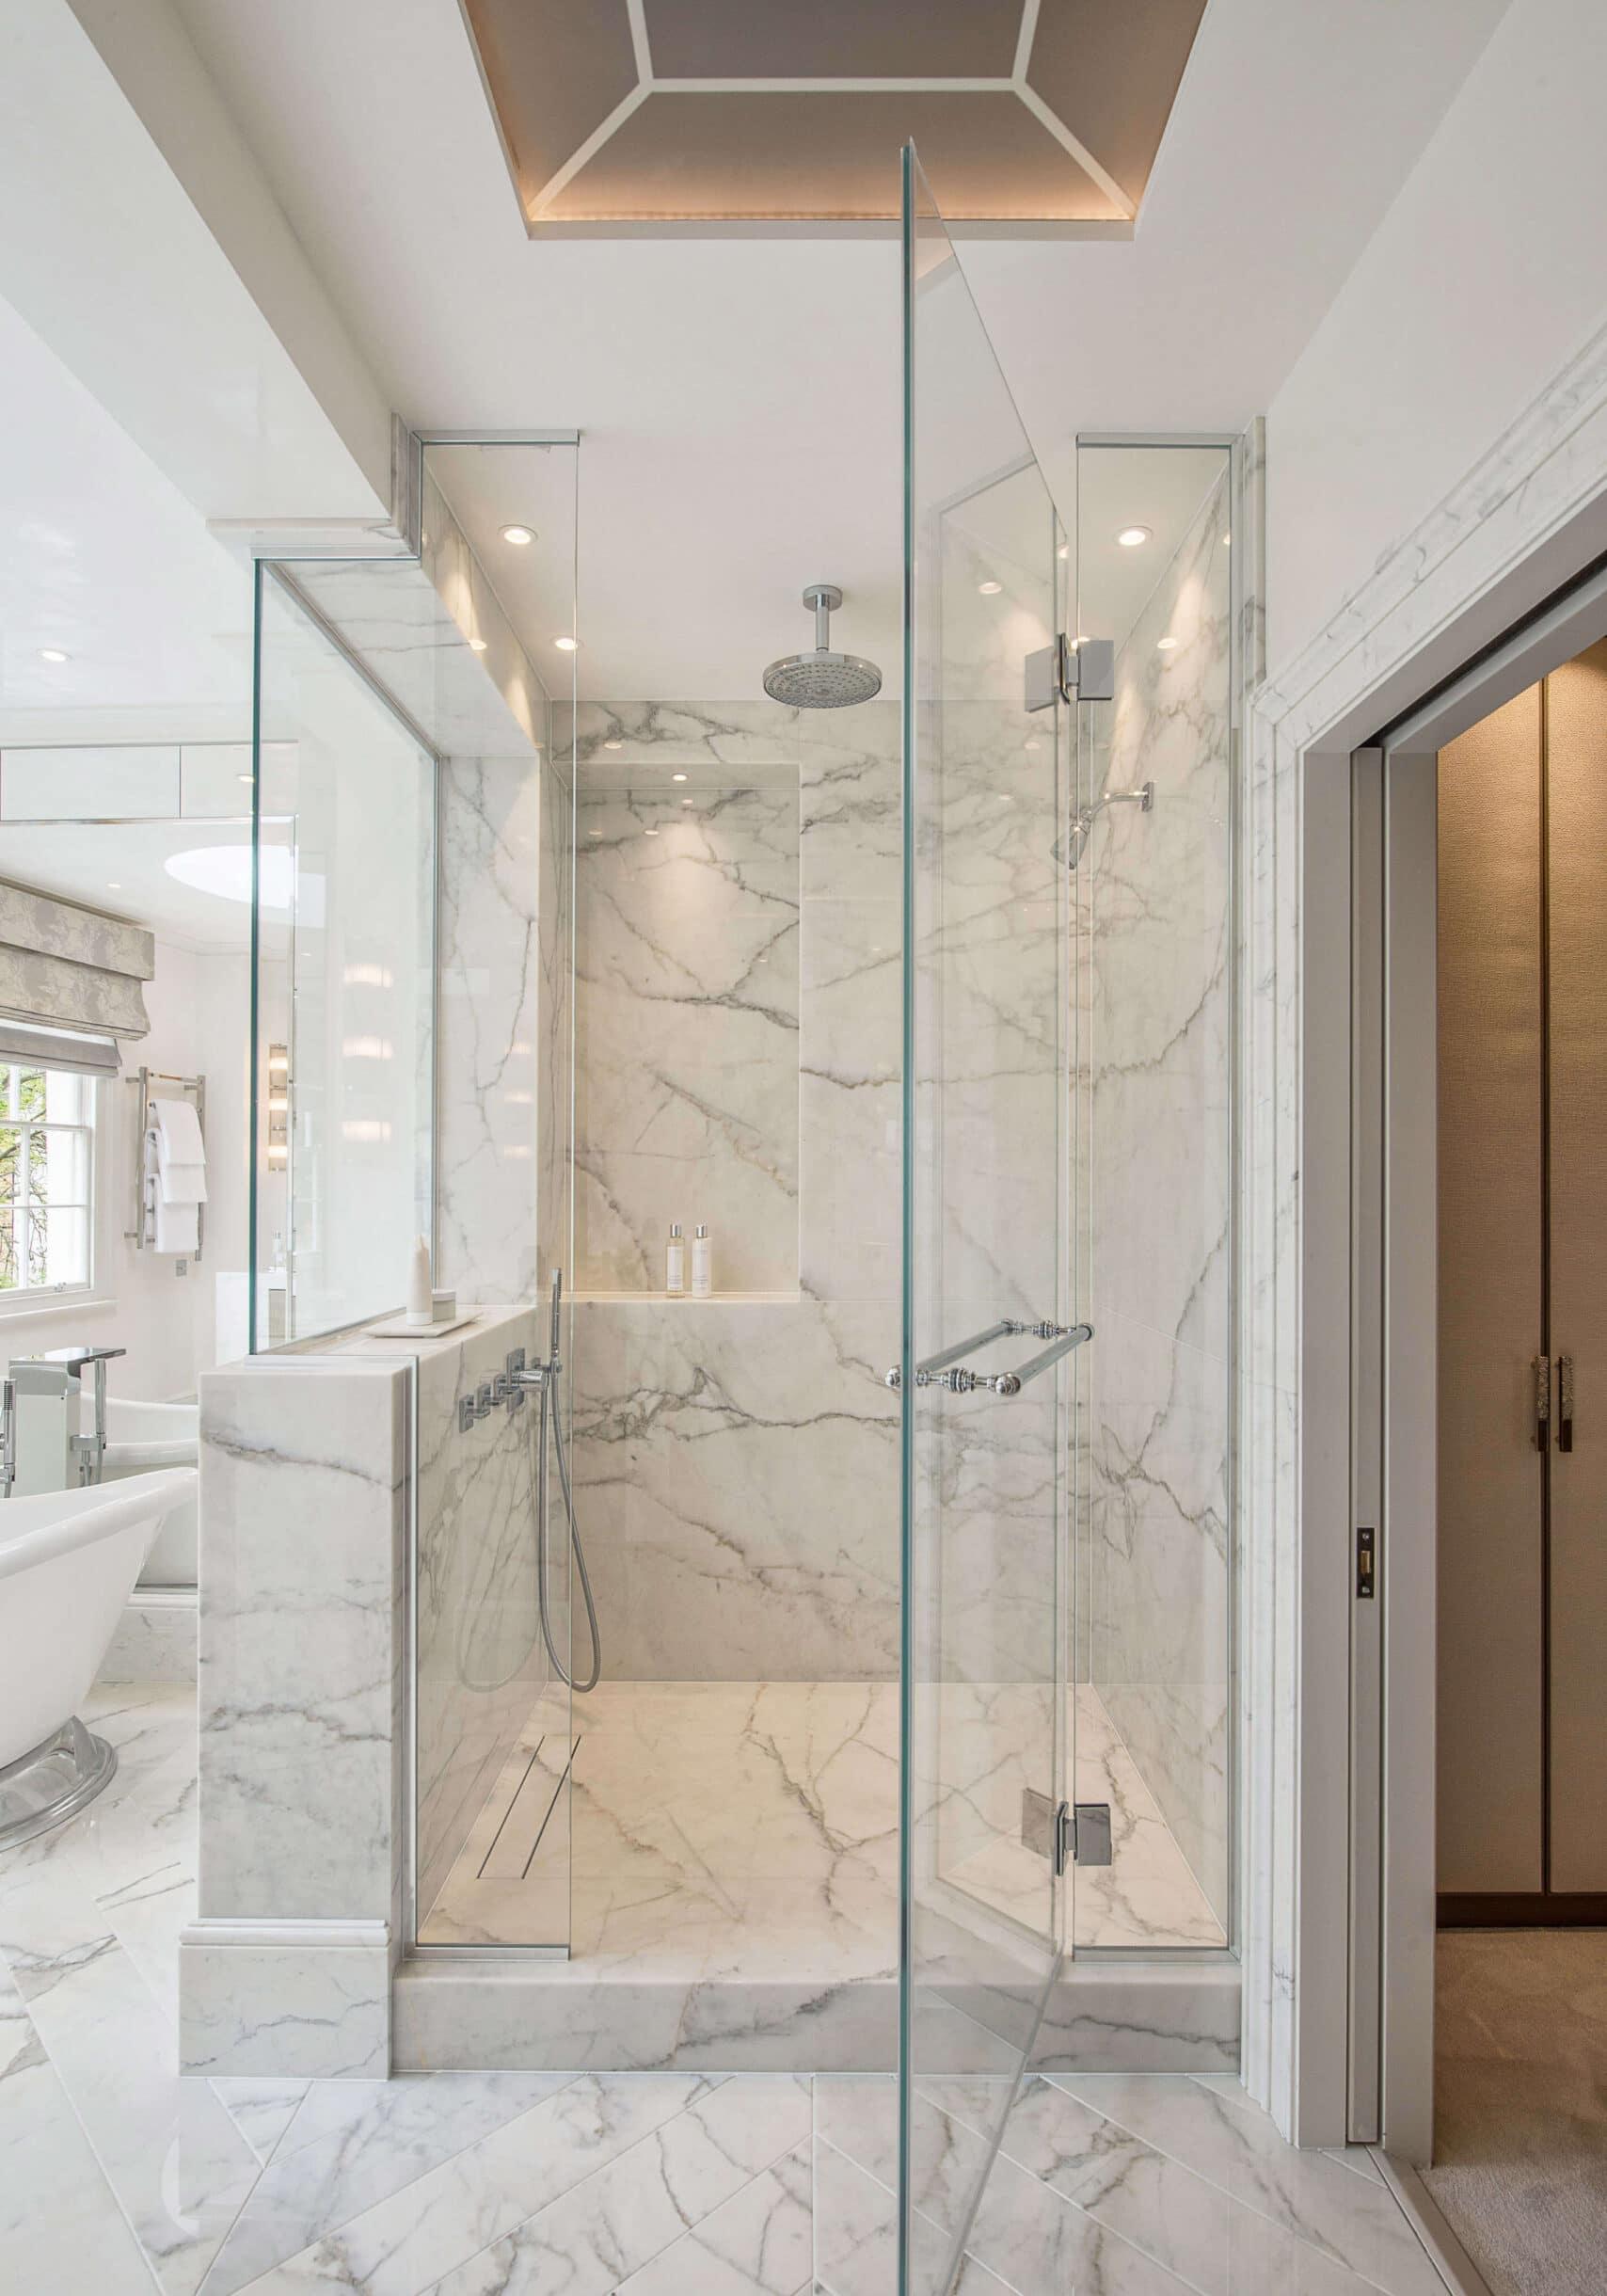 Shower room in townhouse interior design